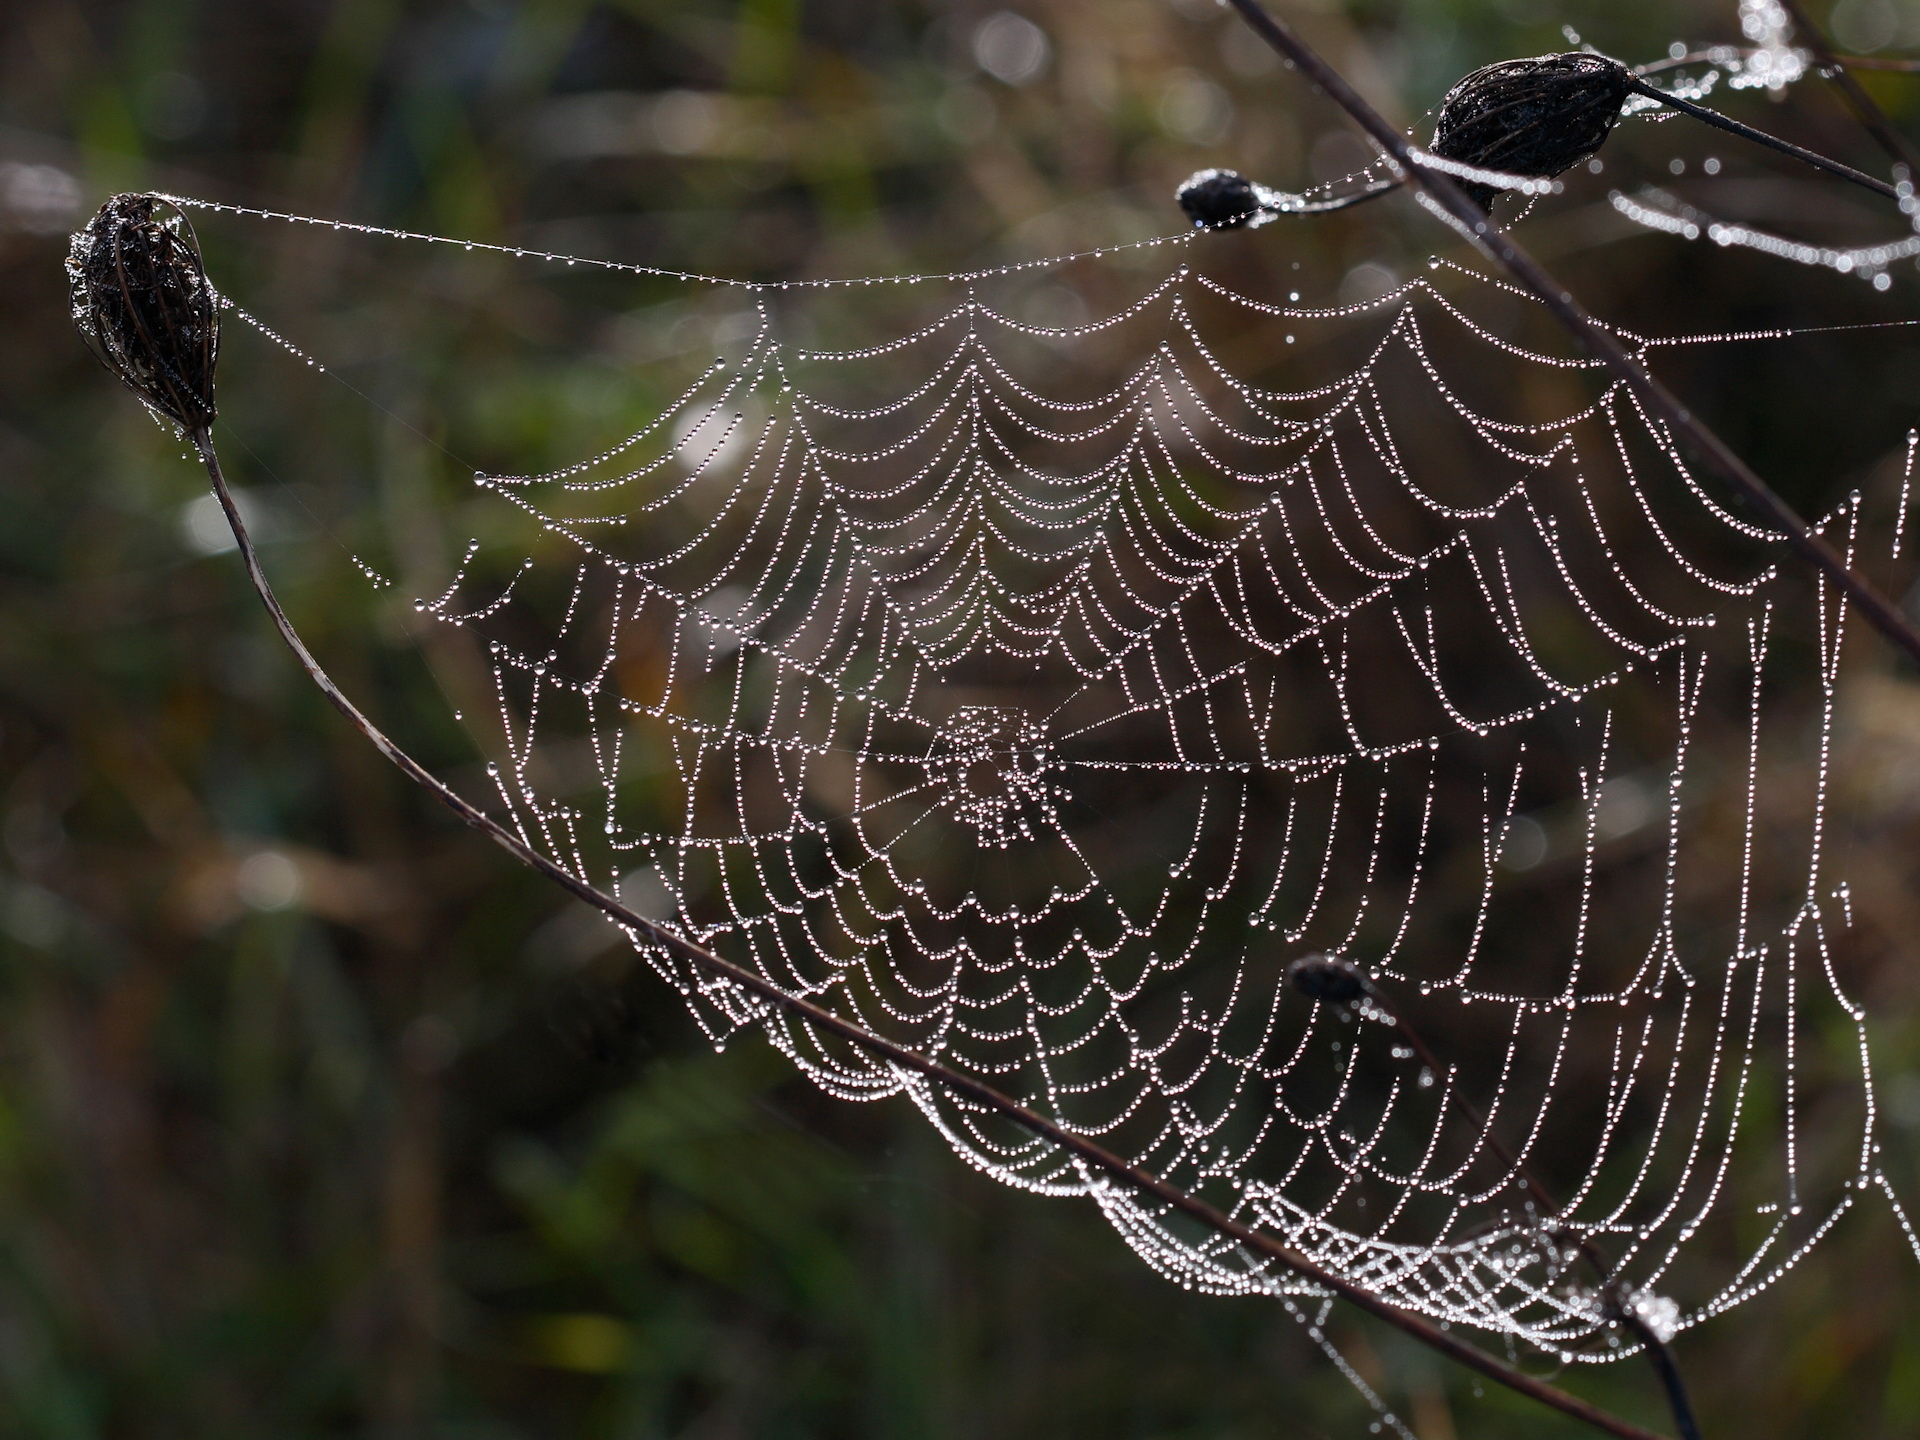 1920x1440 Wet spider web desktop PC and Mac wallpaper 1920x1440